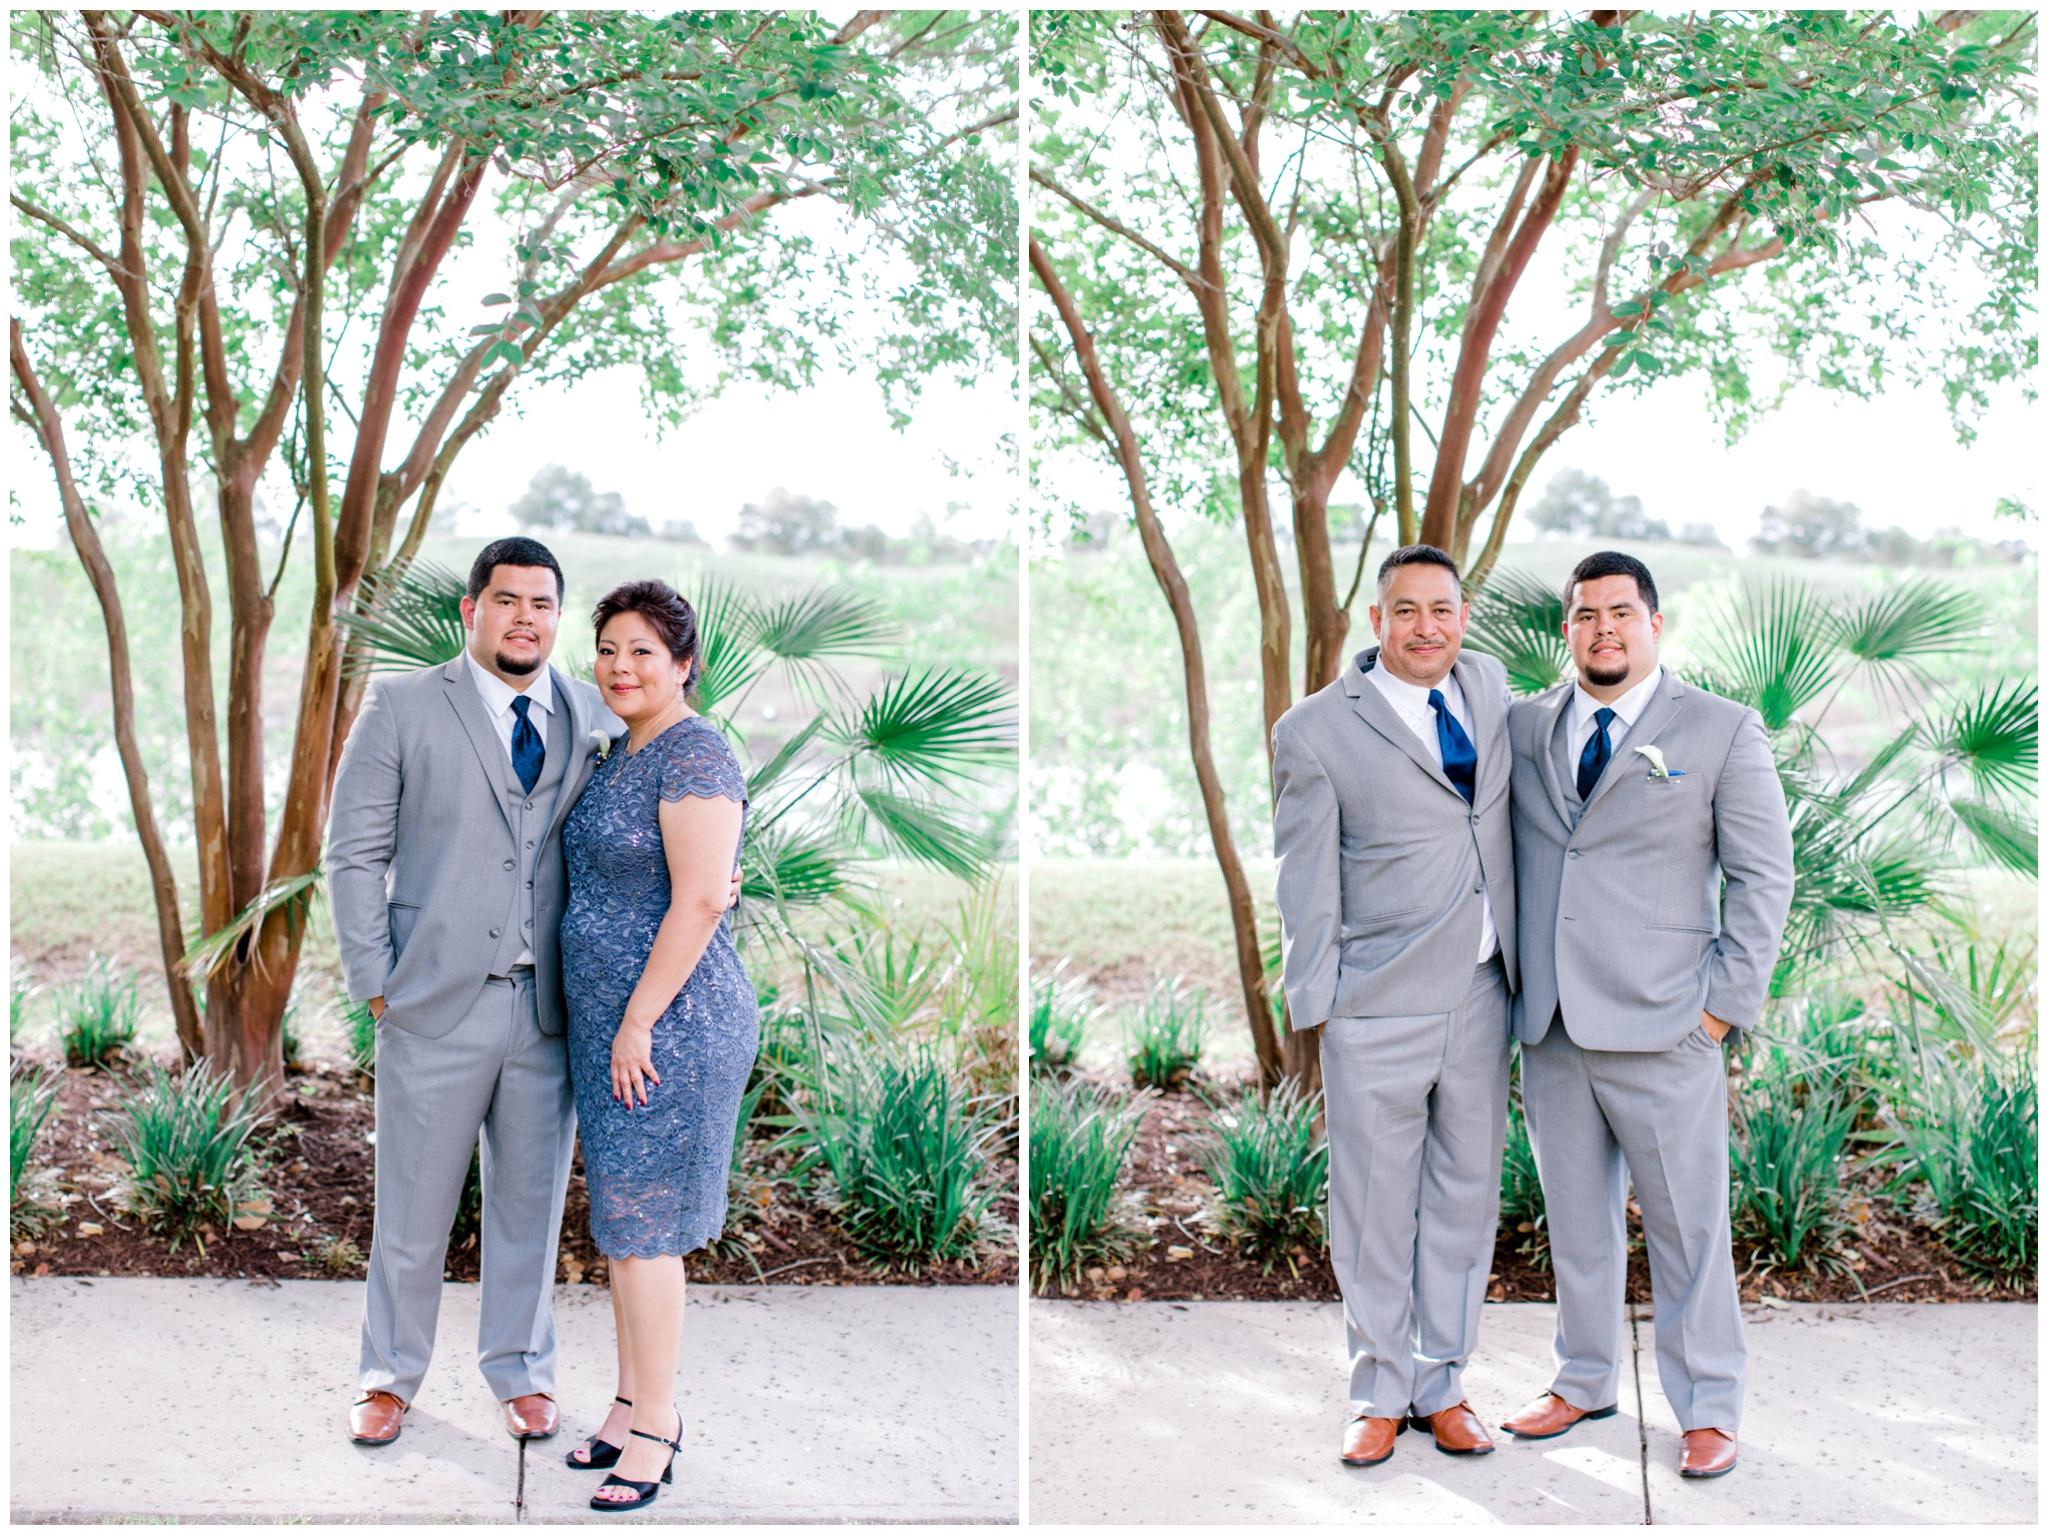 south-carolina-wedding-photographer-58